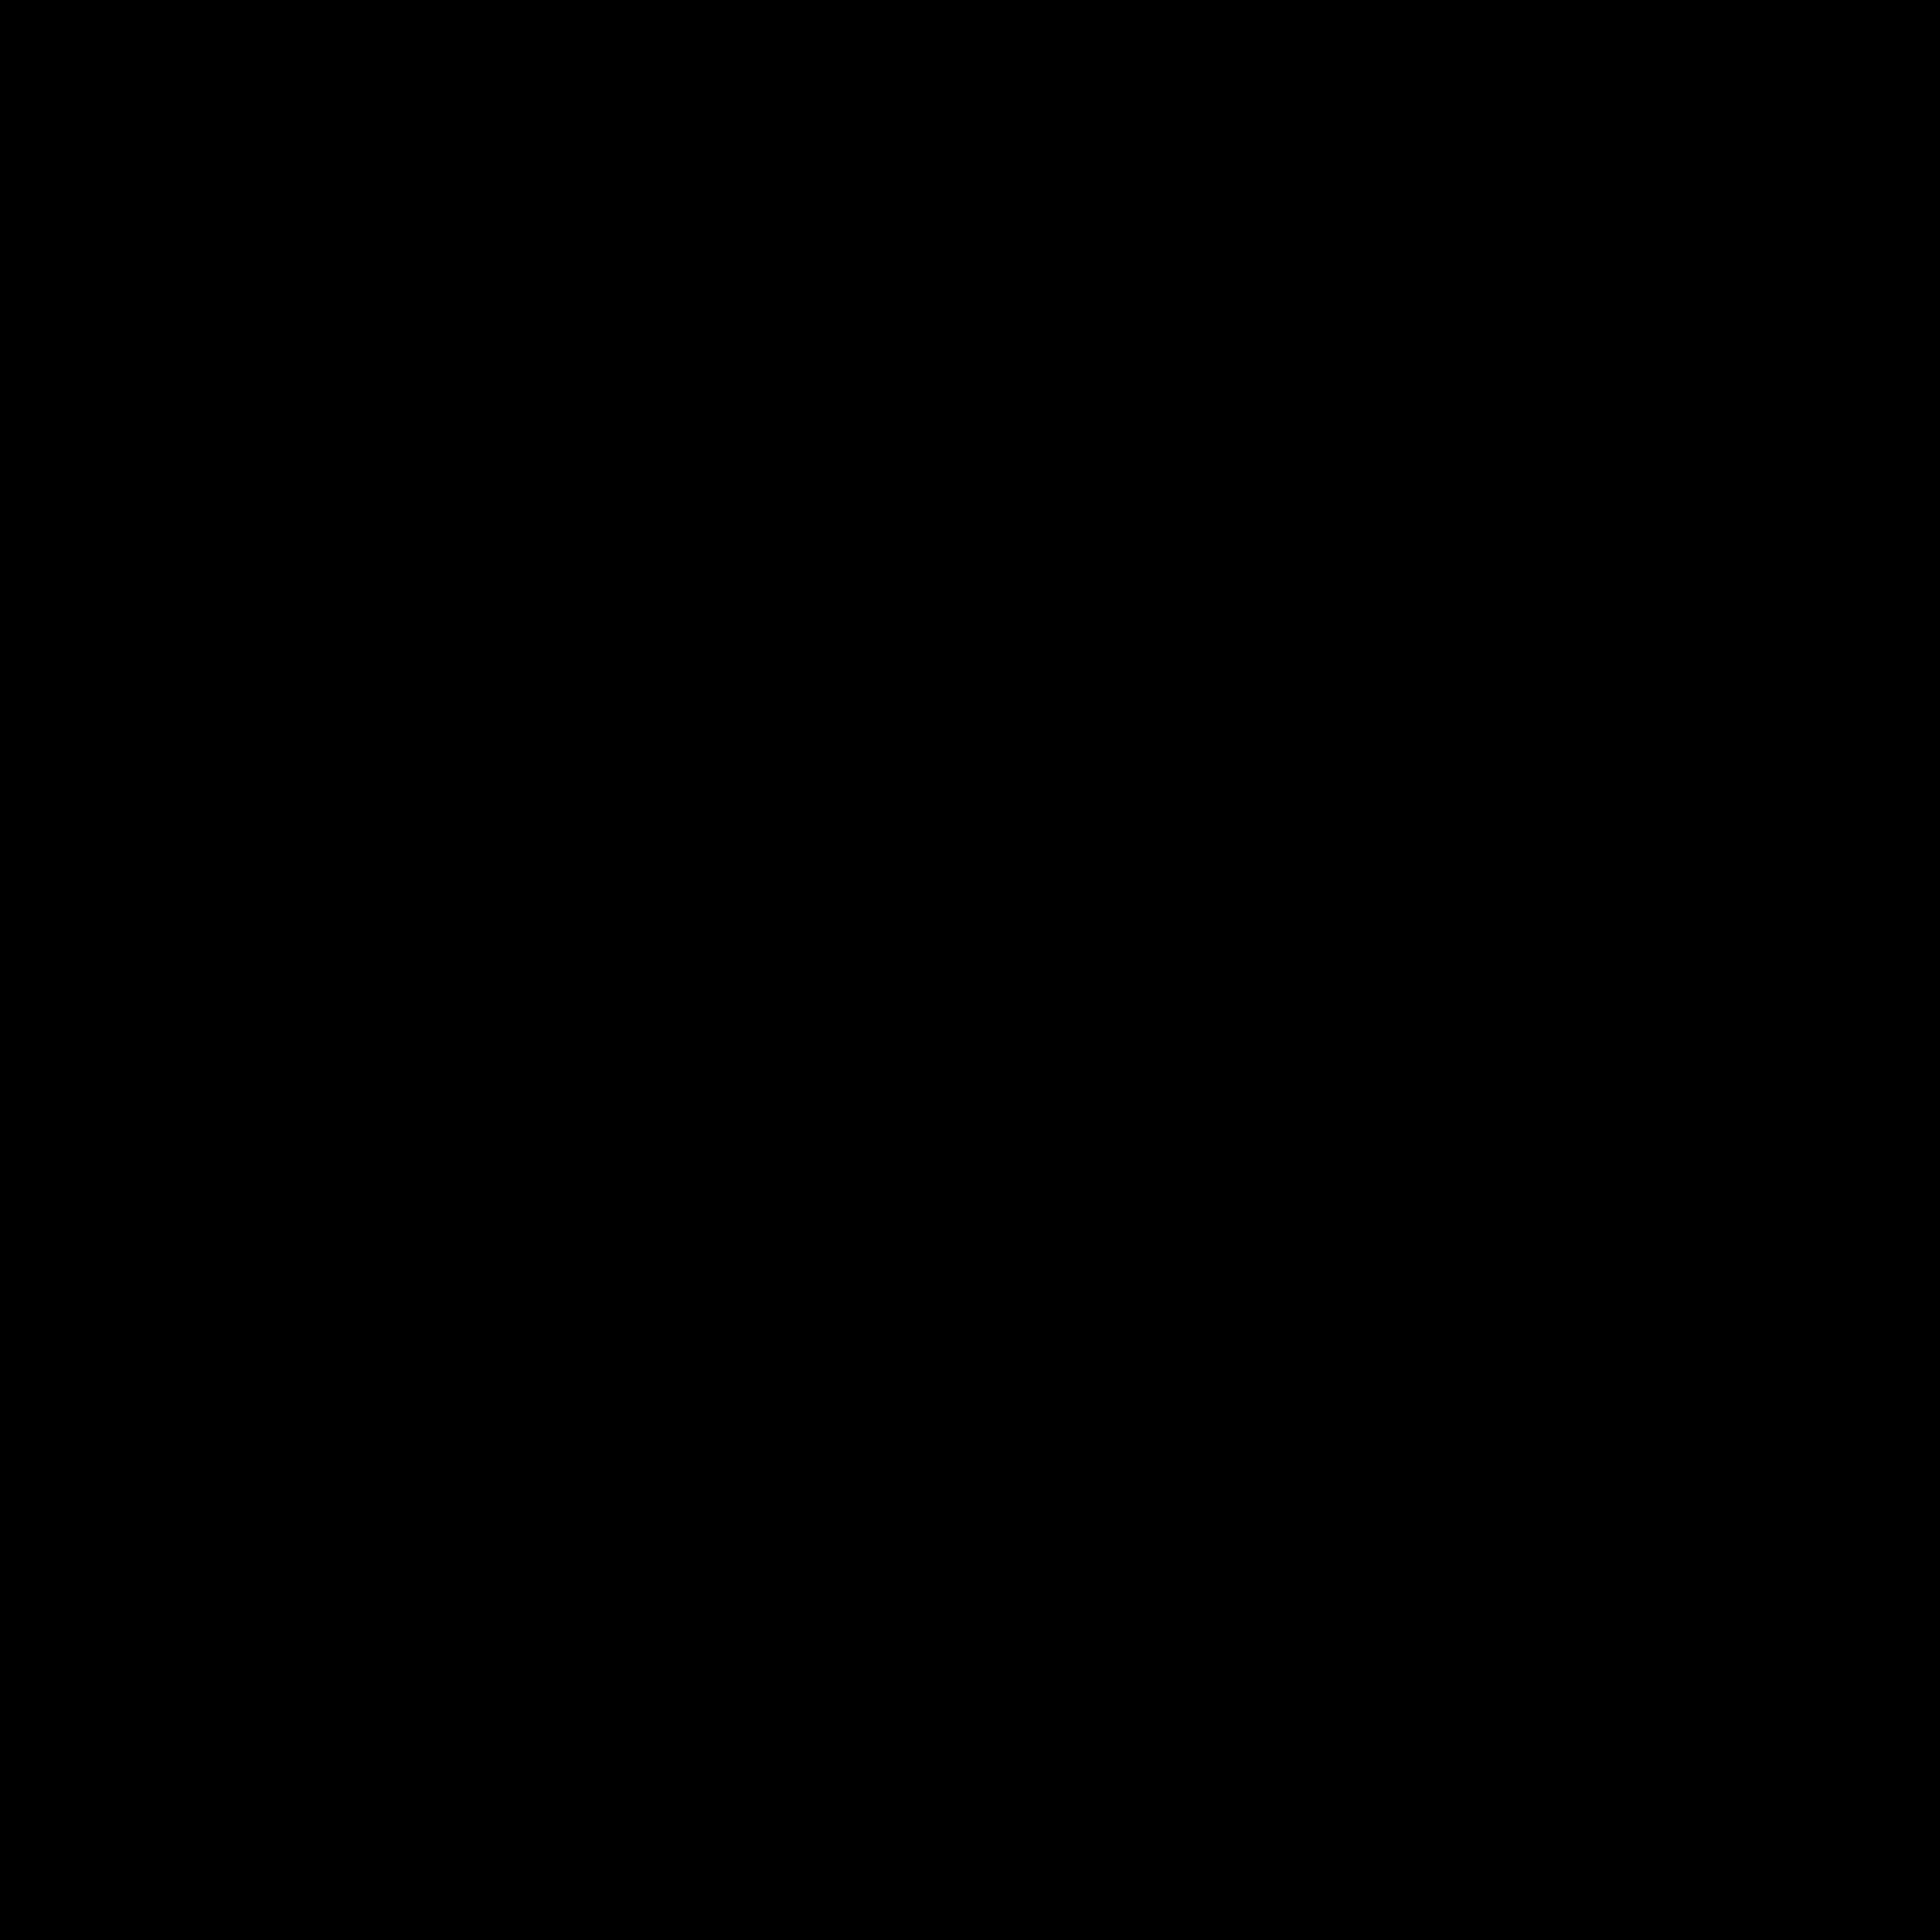 Linkin Park Logos Download